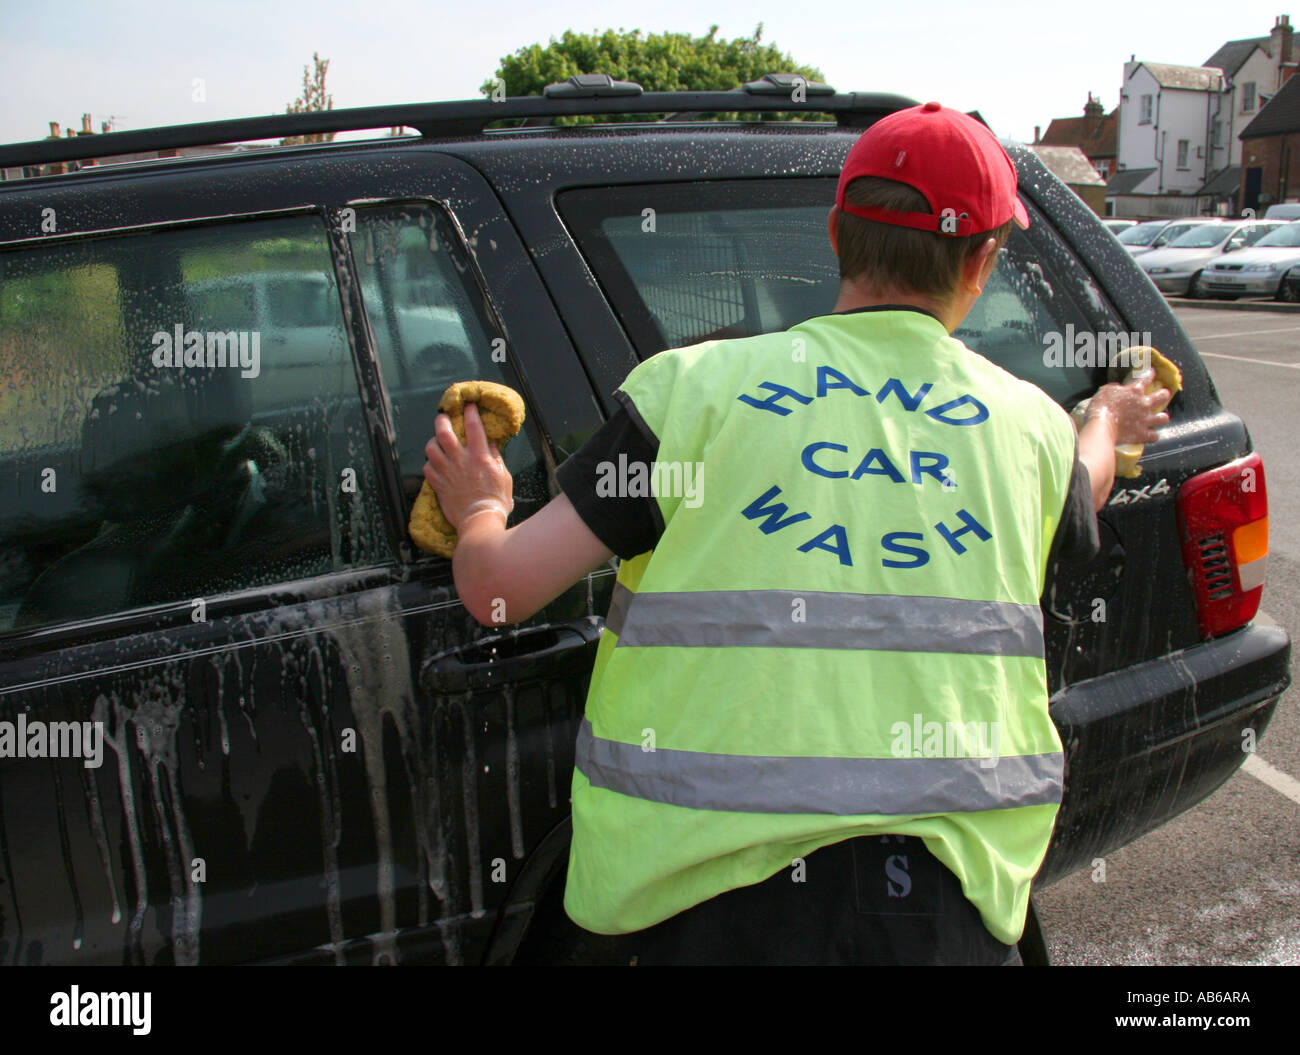 hand car wash - Stock Image